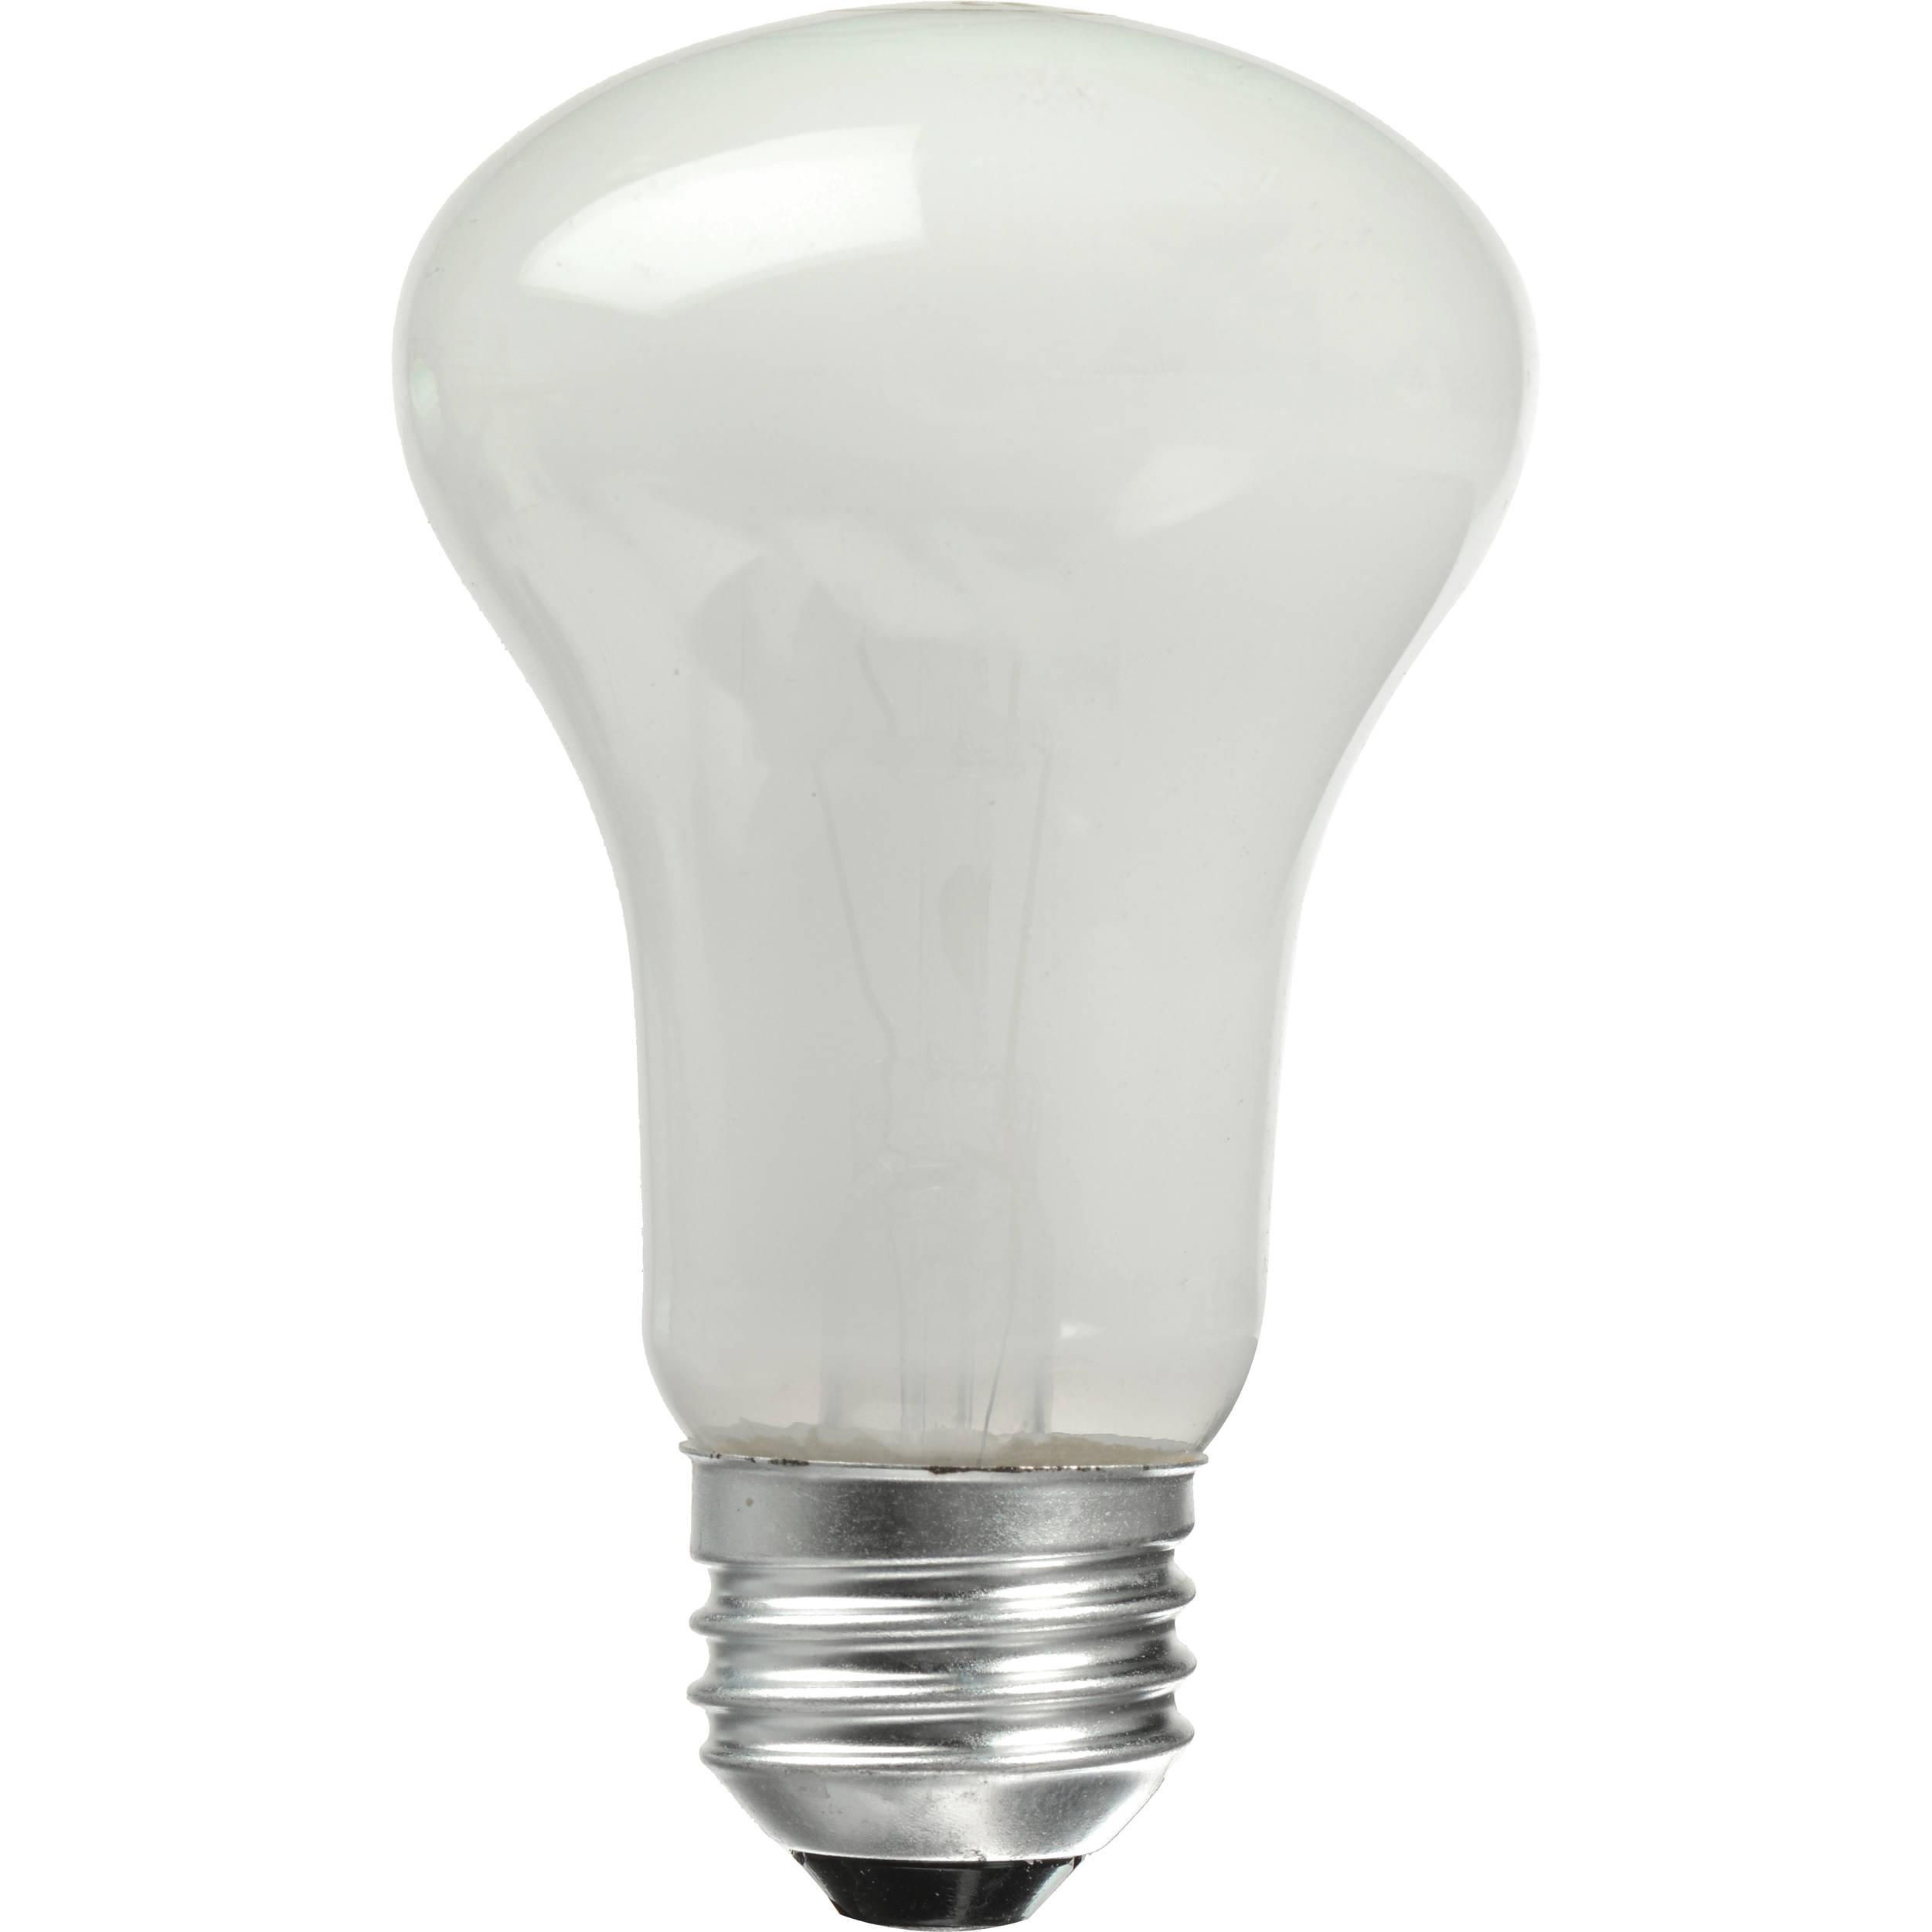 Novatron Modeling L& - 100 watts - for 2140C 2120C 2110C 2105C  sc 1 st  Bu0026H & Novatron Modeling Lamp - 100 watts - for 2140C 2120C N4101 Bu0026H azcodes.com